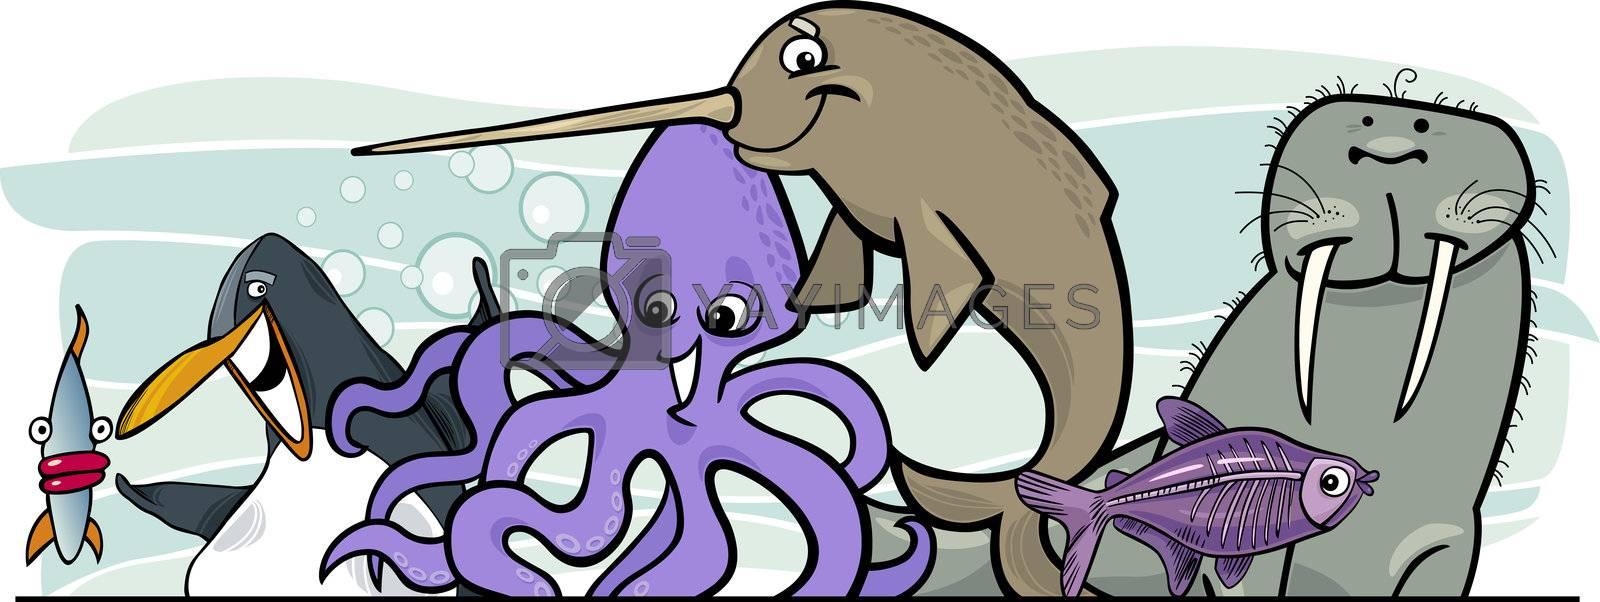 Cartoon illustration of Sea Life Animals header design